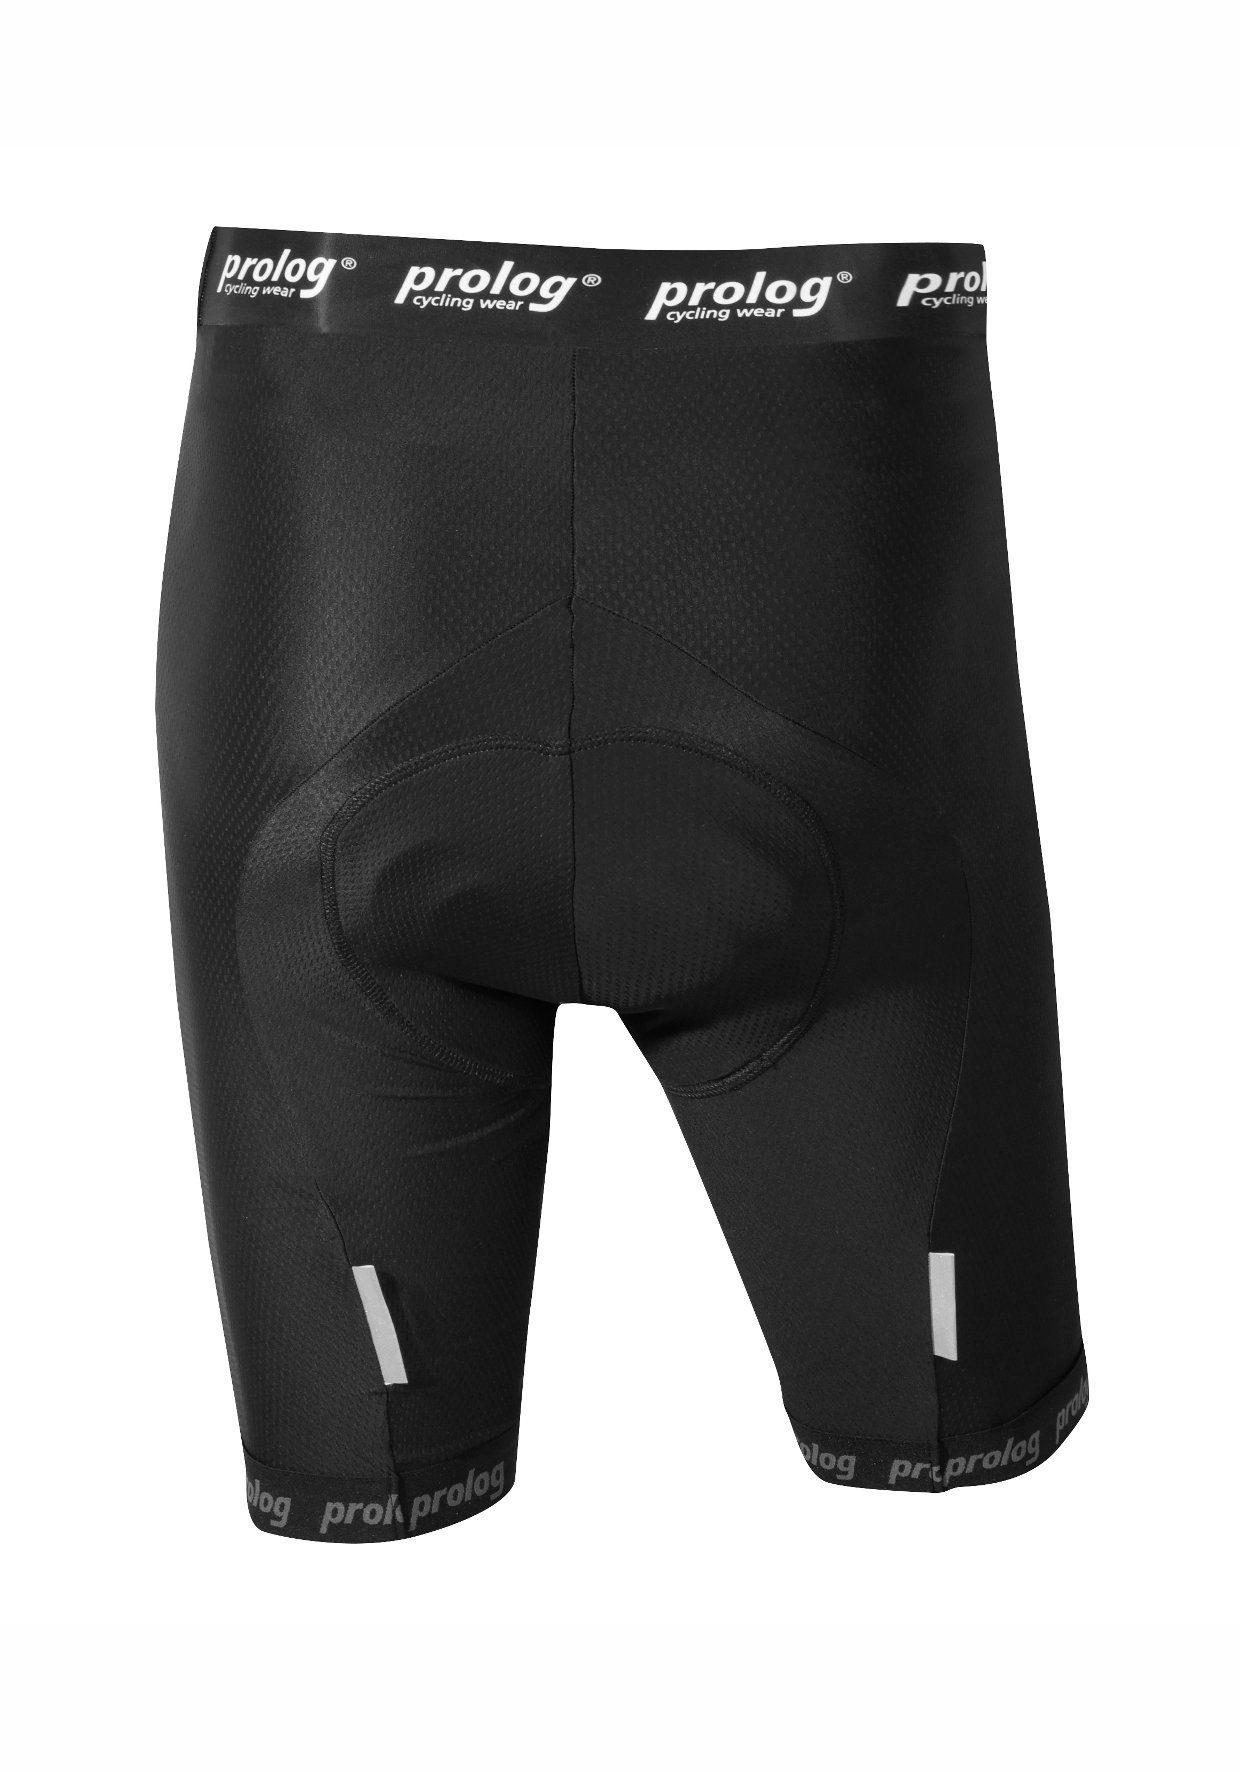 prolog cycling wear Radhose, Funktionale Radhose ohne Träger mit Sitzpolster